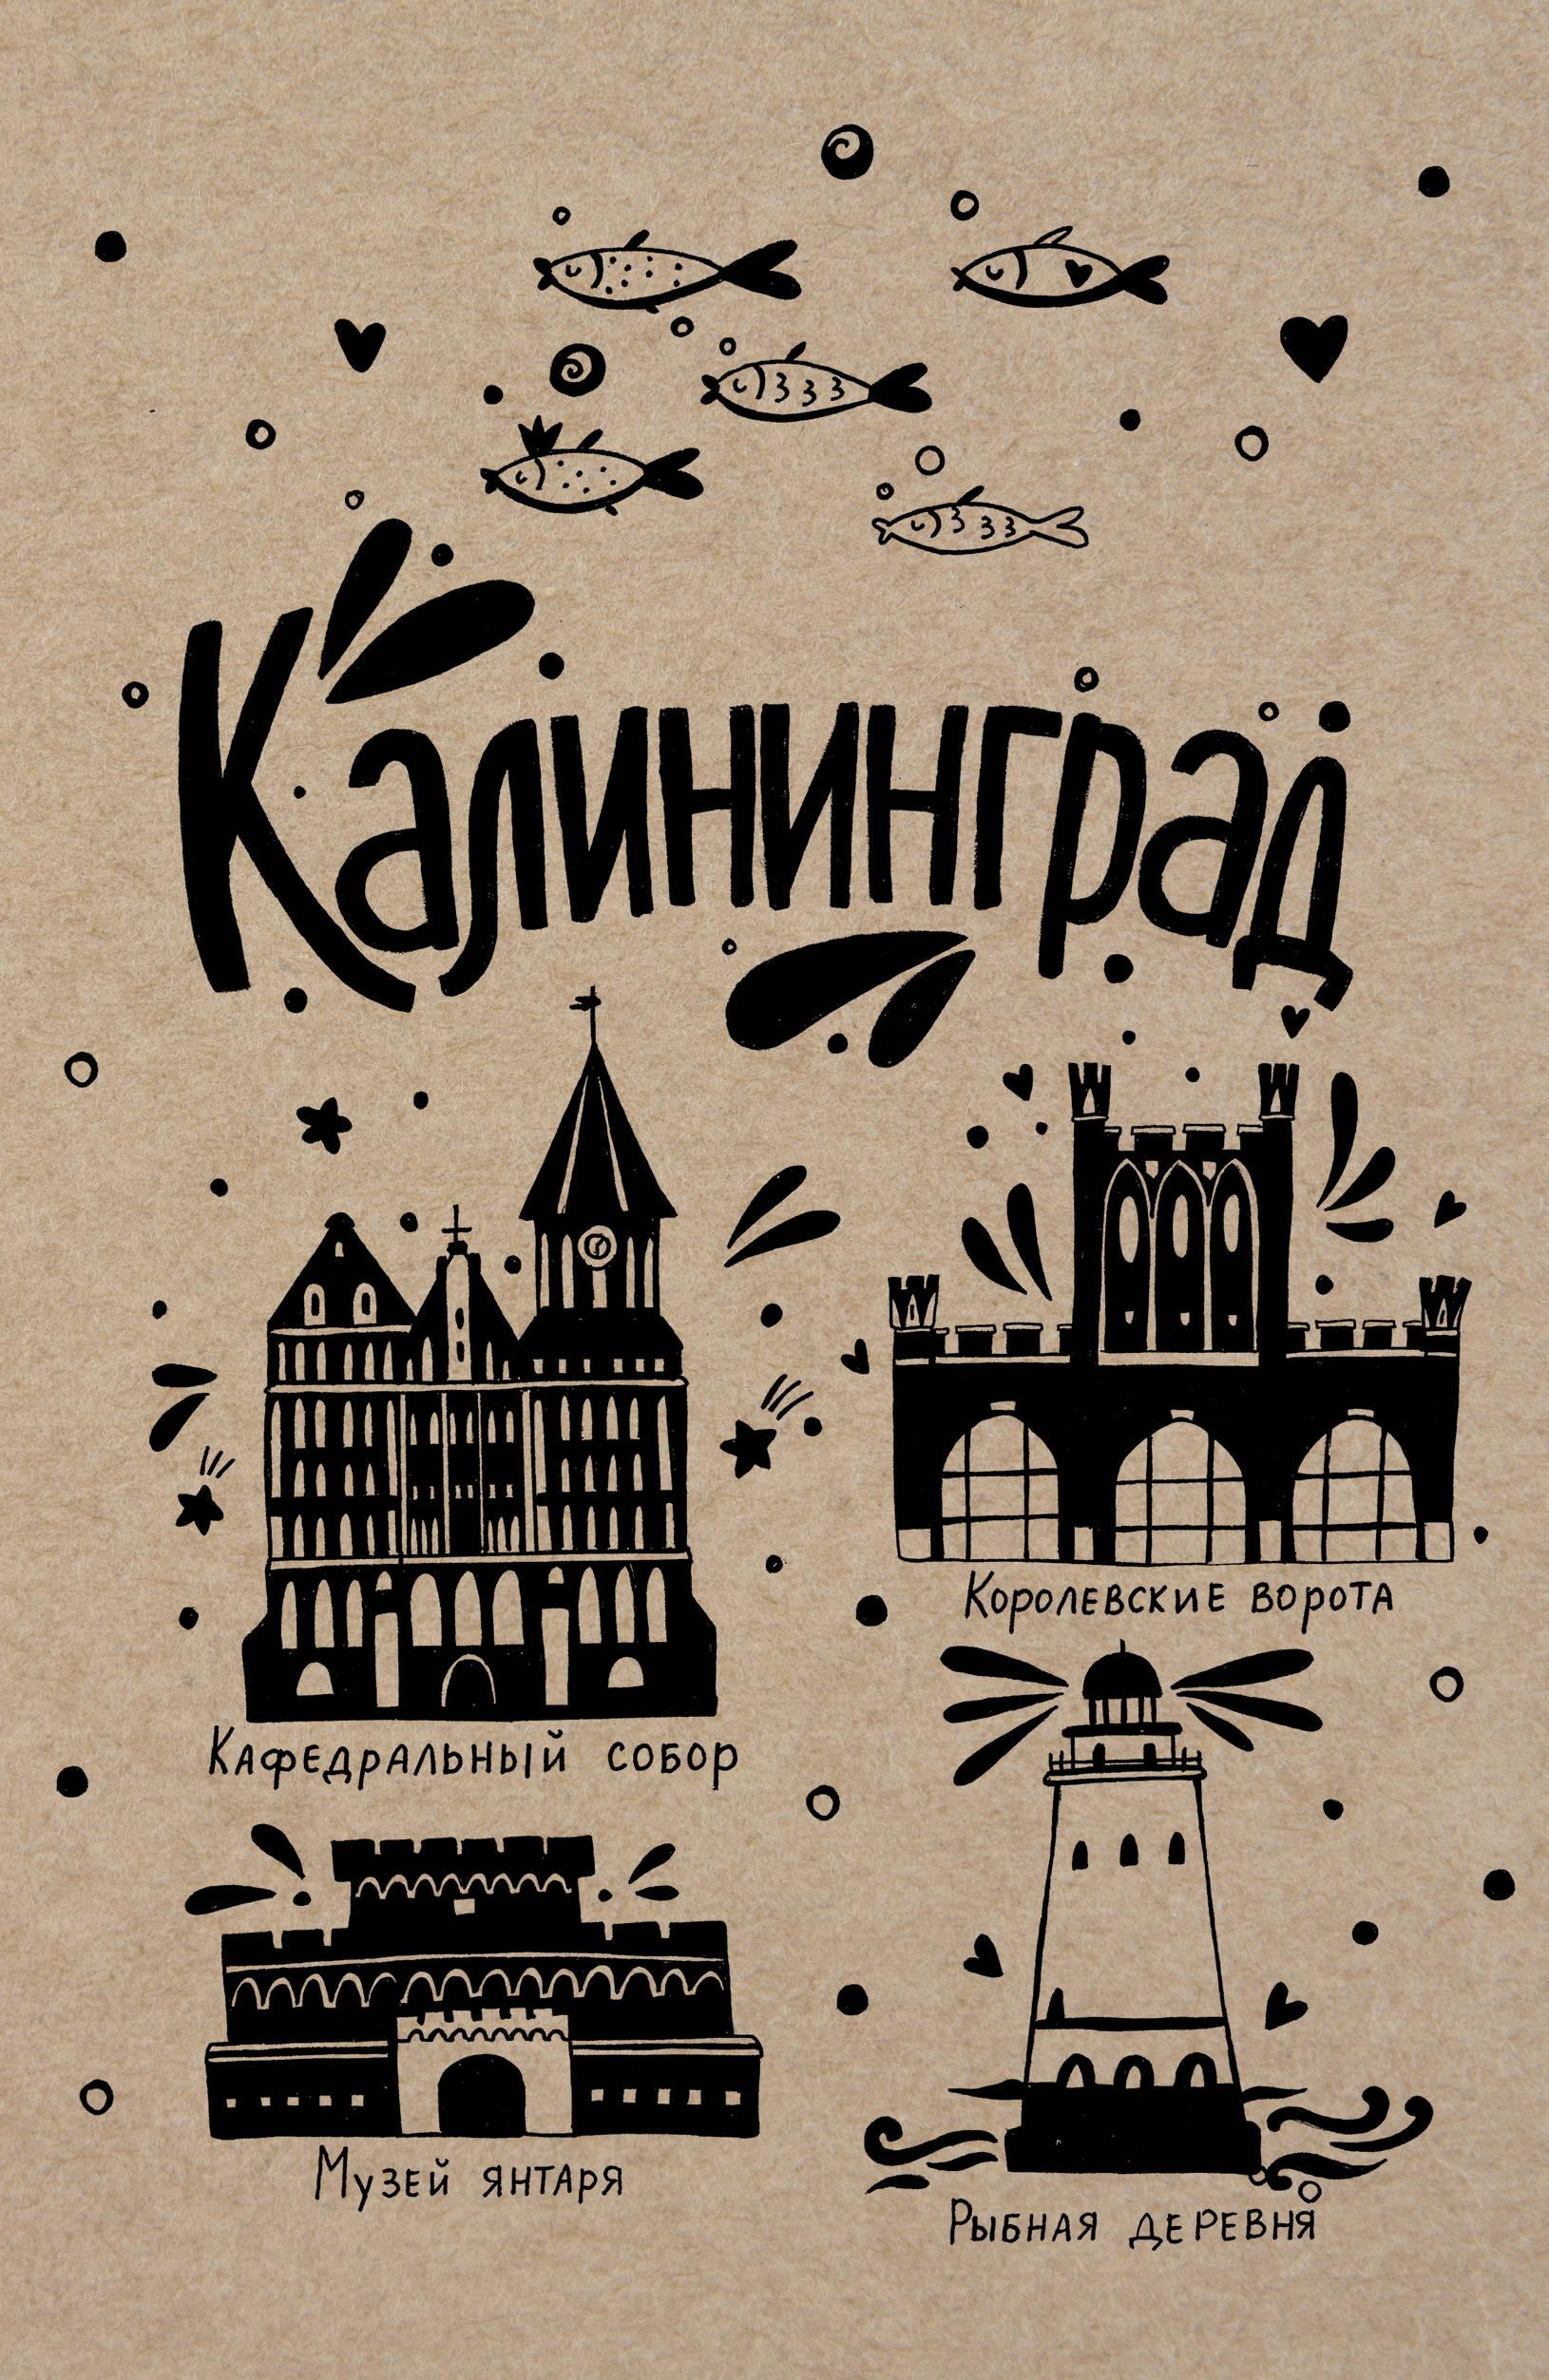 Блокнот. Калининград калининград землю в зеленополье